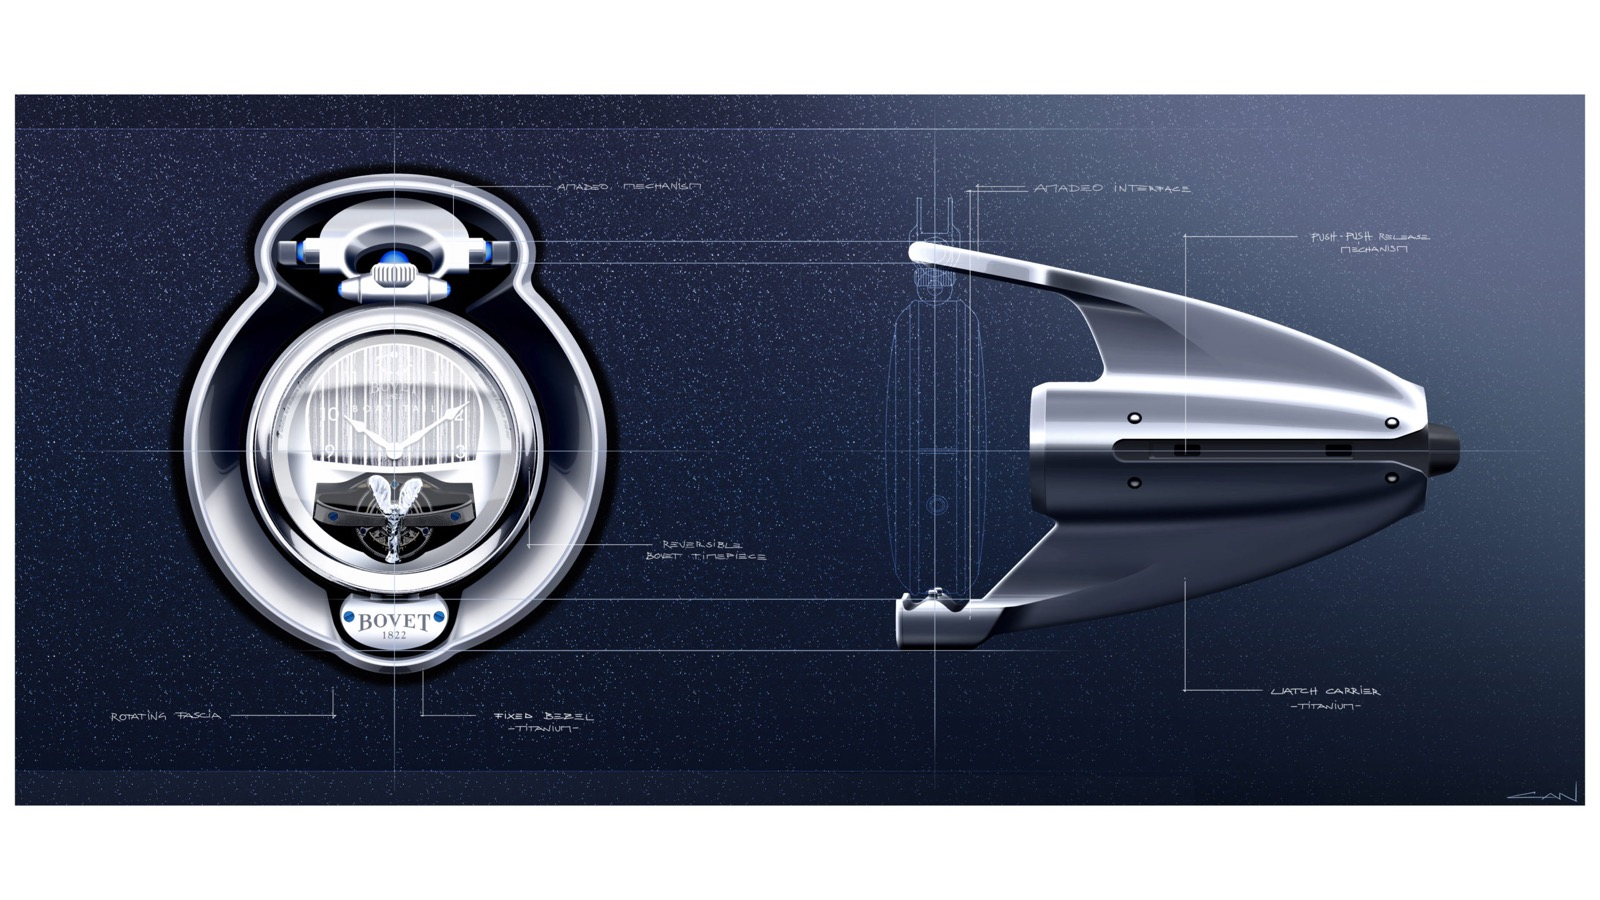 Bovet X Rolls-Royce Boat Tail